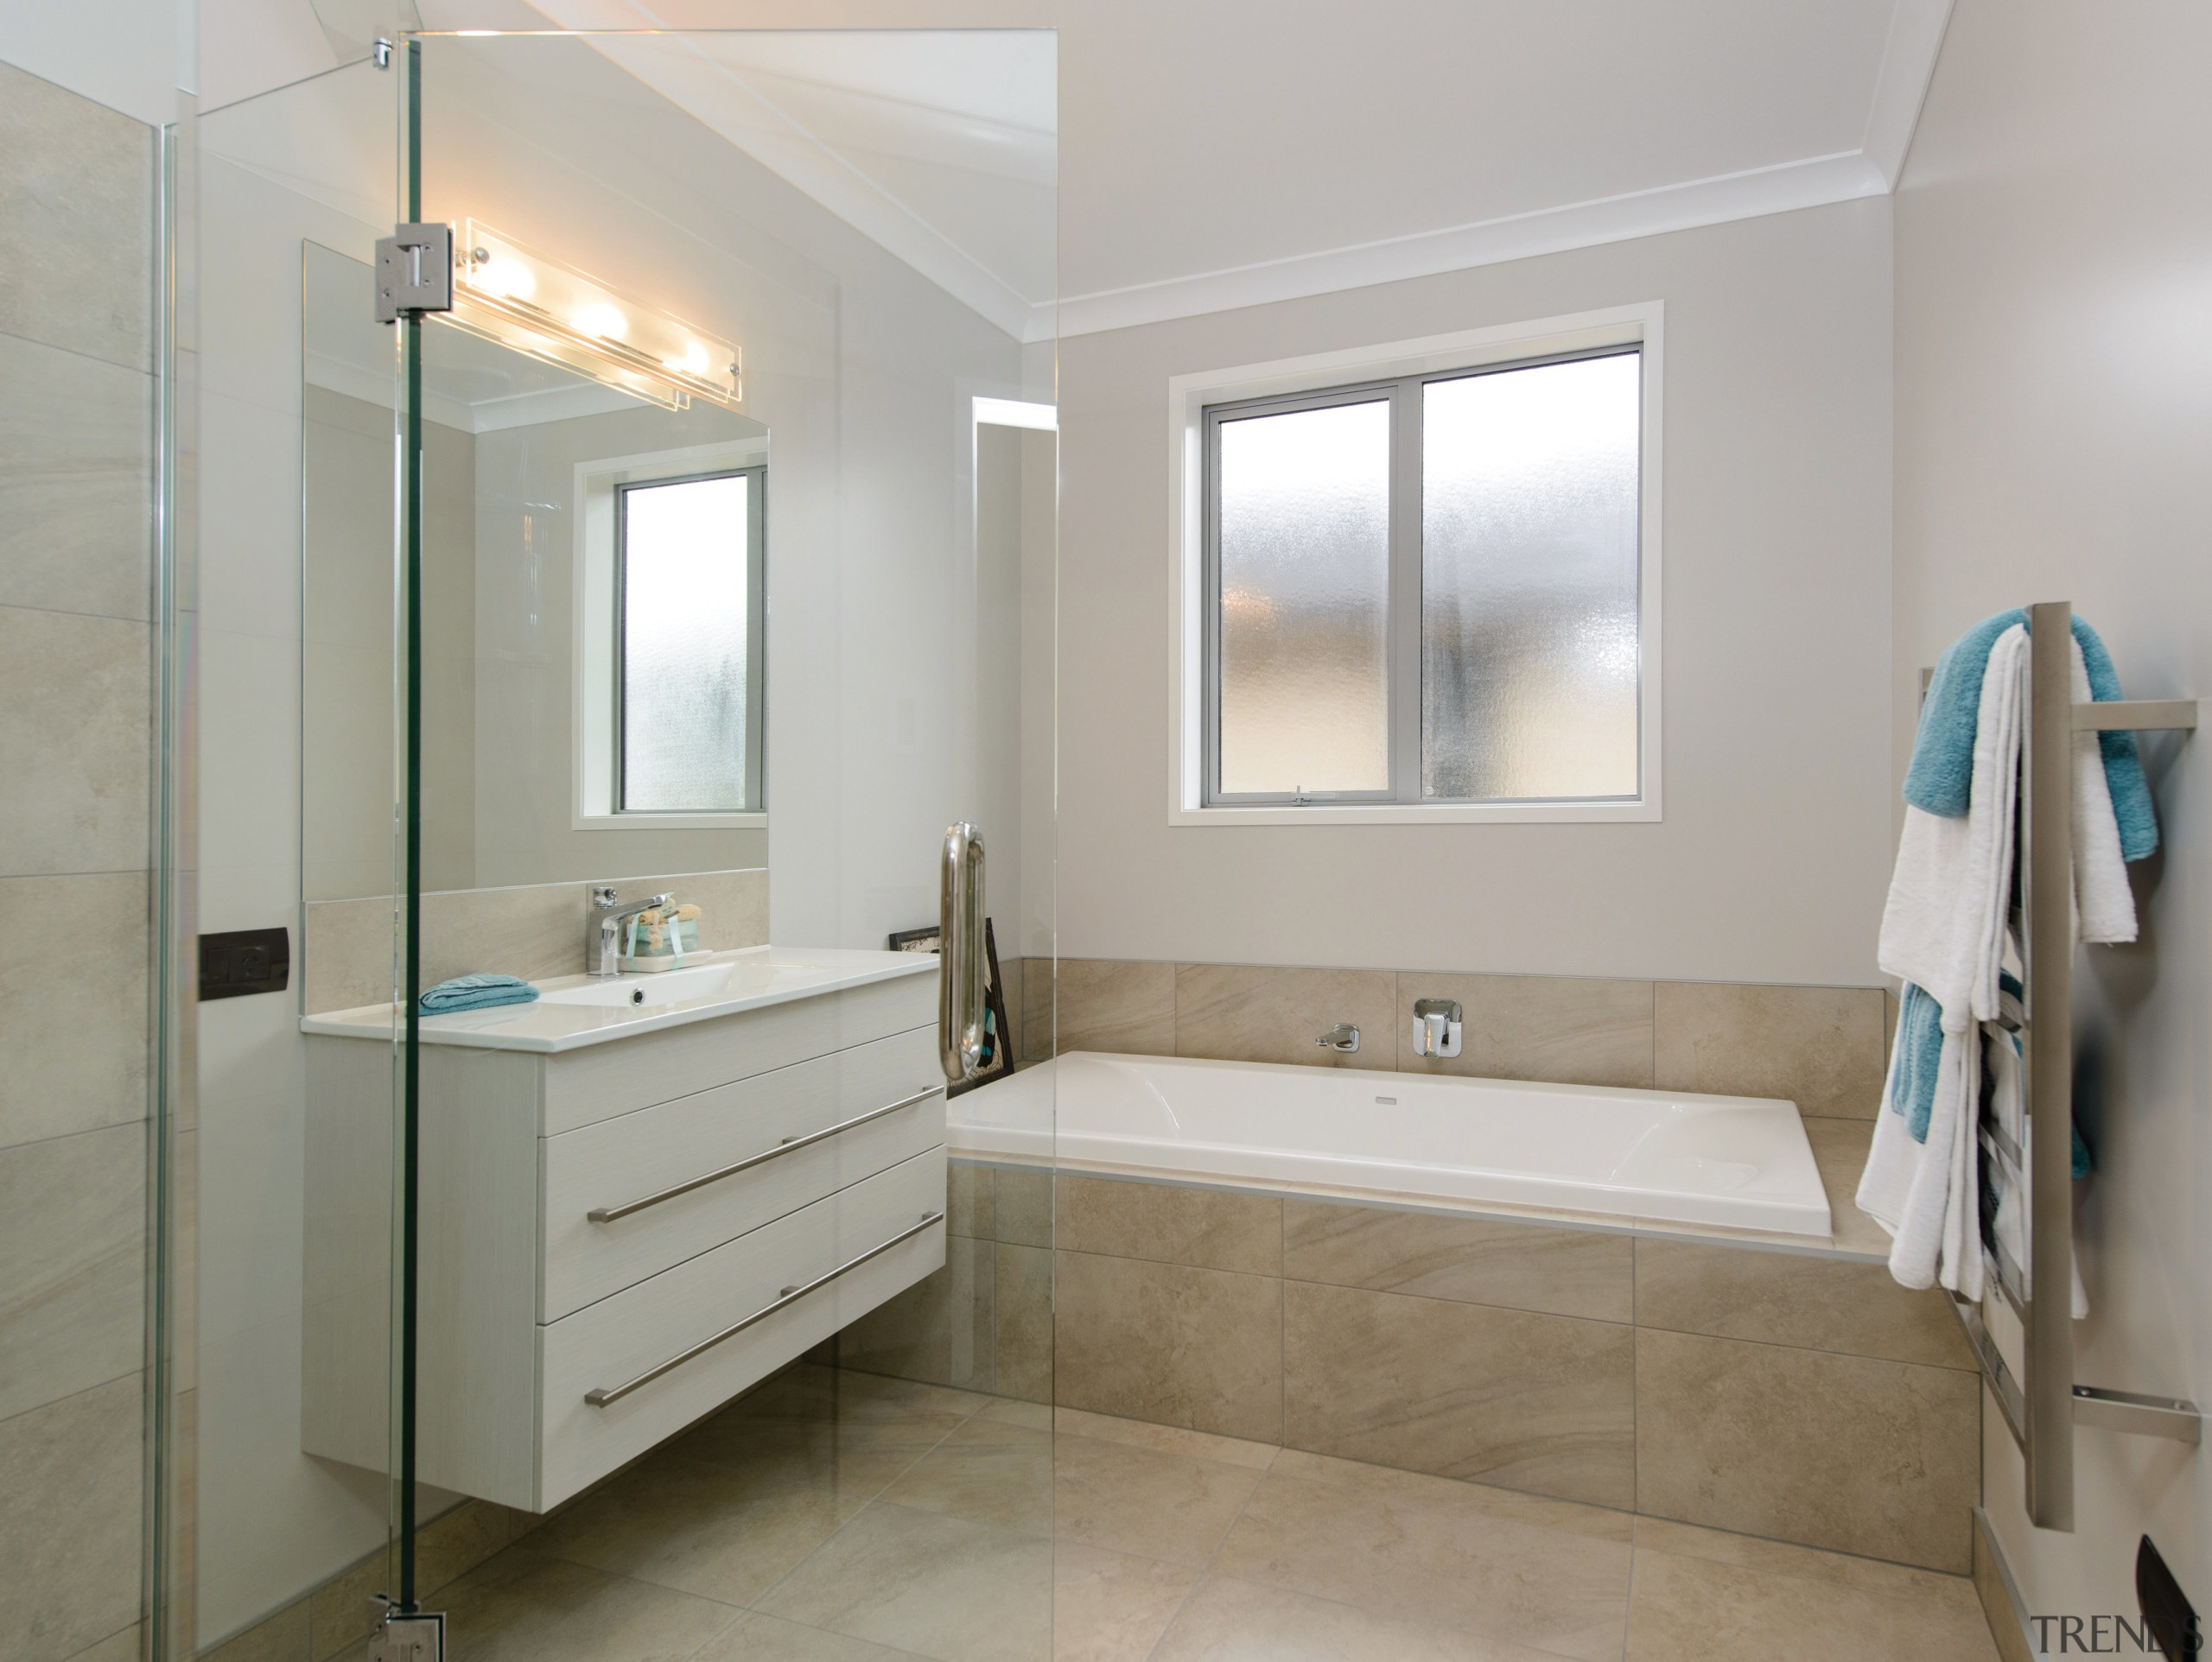 GJ Gardner Homes show home bathroom - GJ bathroom, bathroom accessory, bathroom cabinet, floor, home, interior design, real estate, room, sink, tile, gray